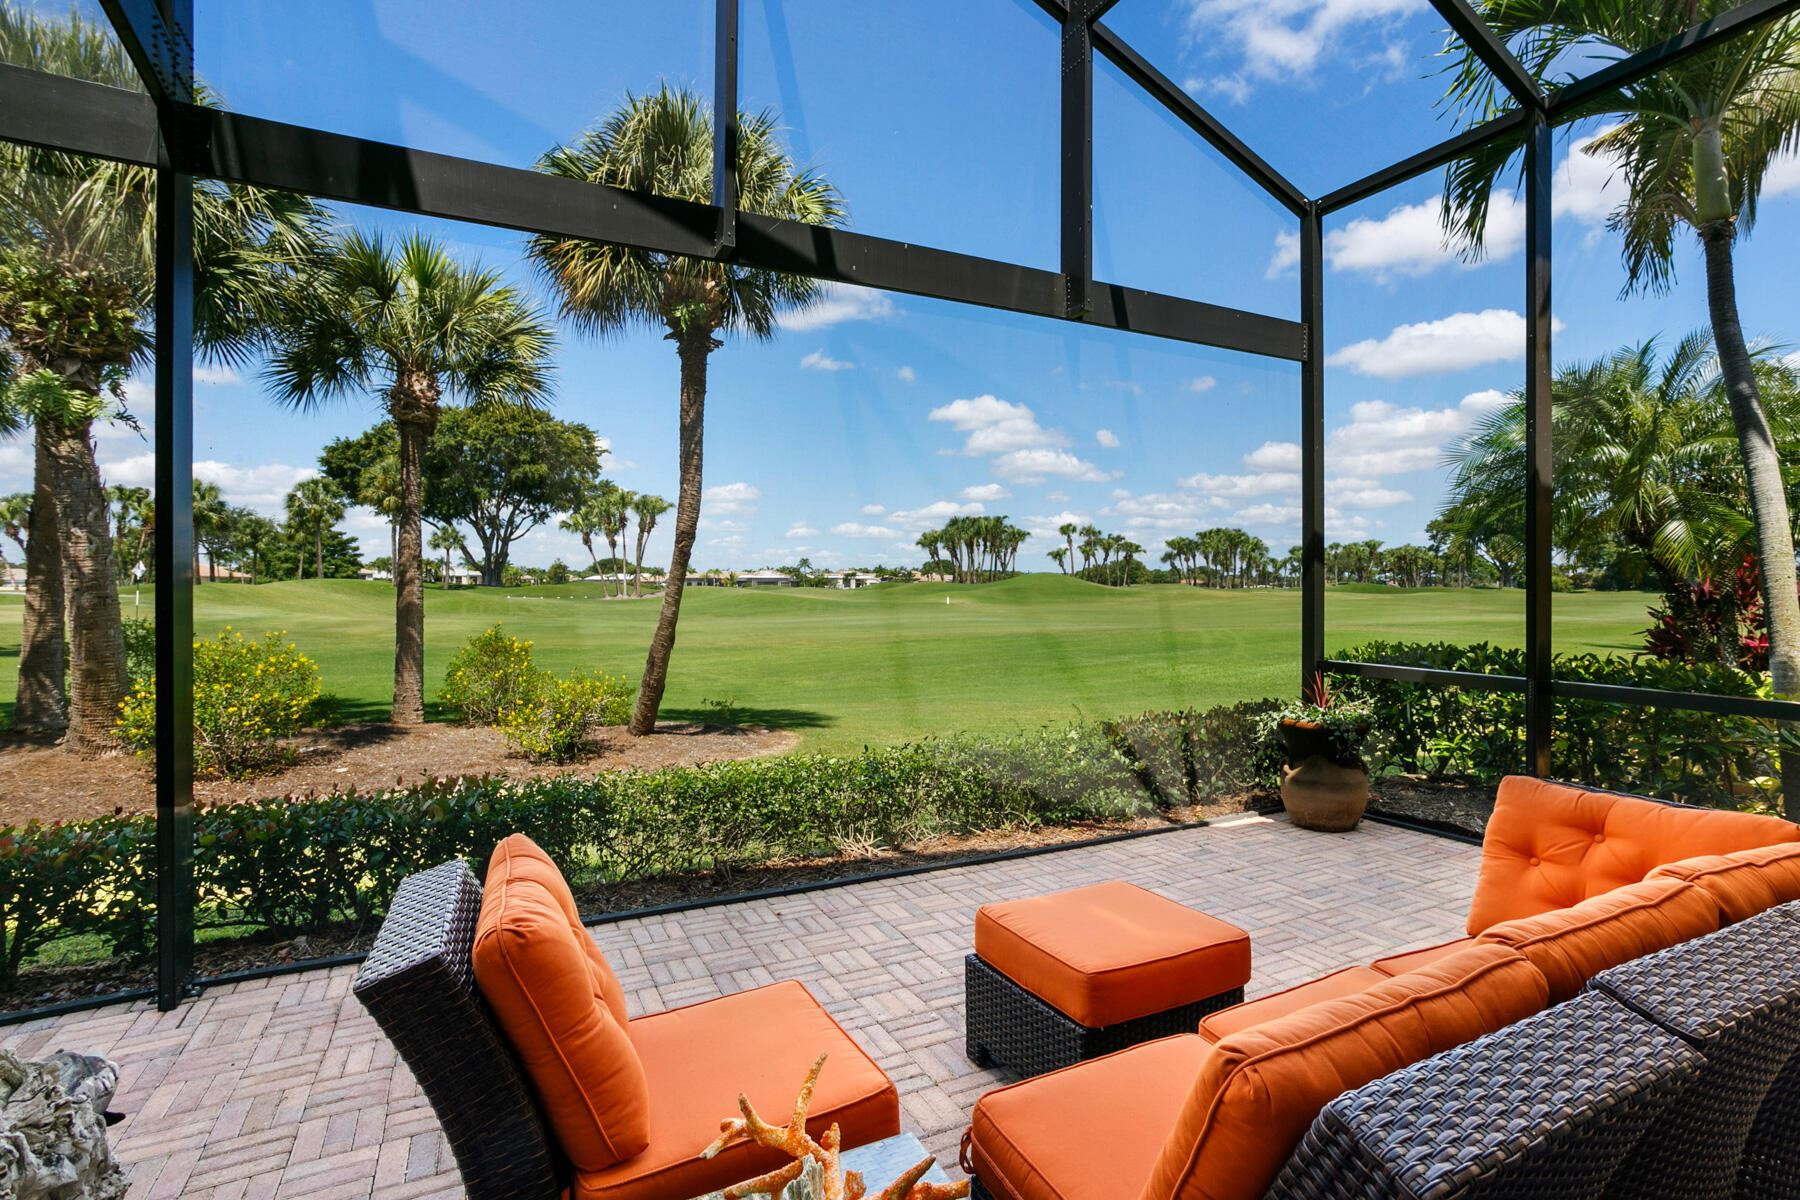 Photo of 7631 Iris Court, West Palm Beach, FL 33412 (MLS # RX-10718712)